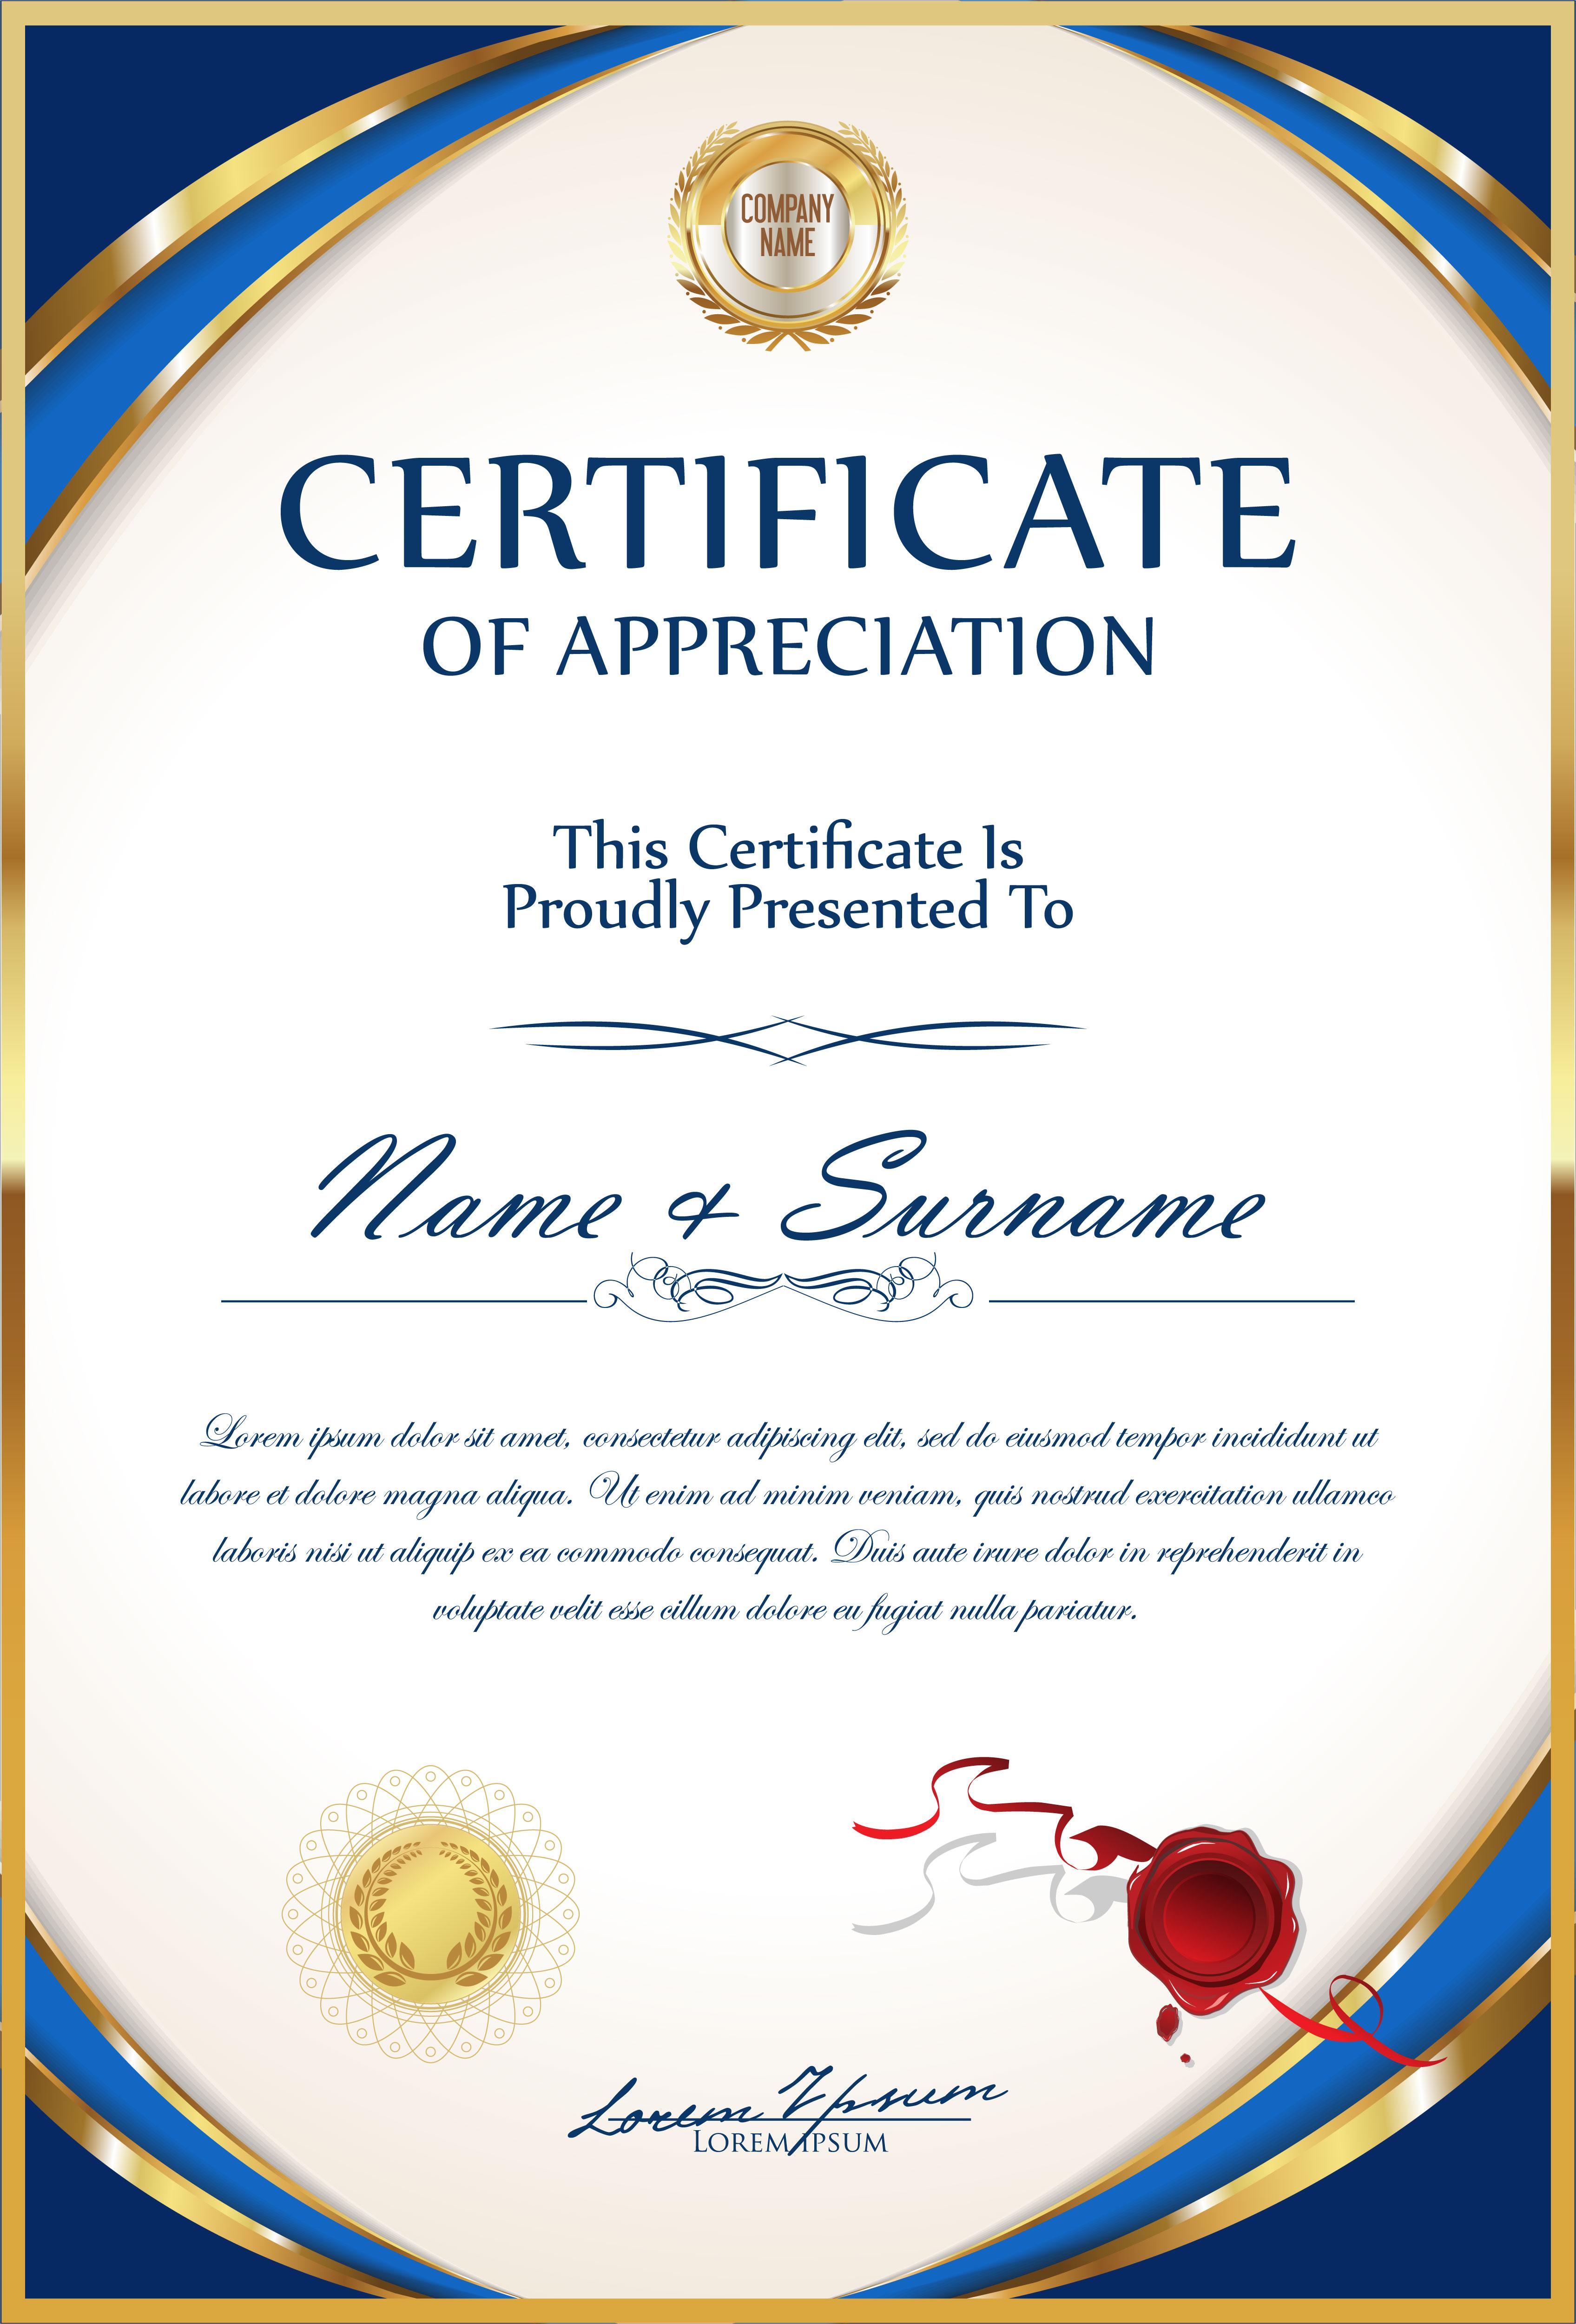 certificate vector diploma vecteezy template retro fancy illustration